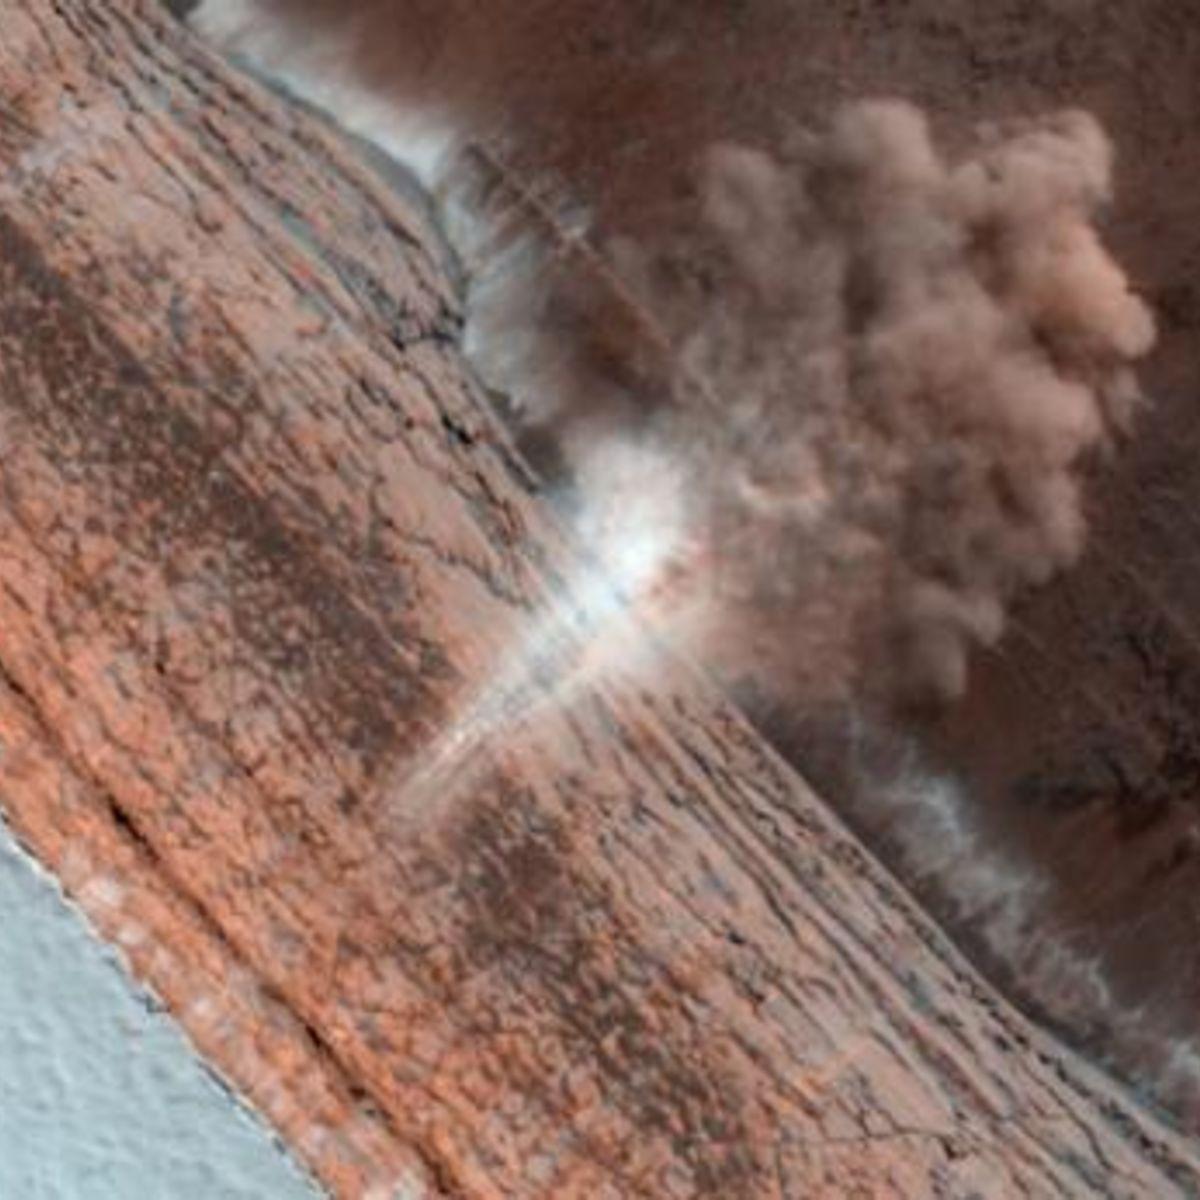 HiRISE_avalanche_March2010_590.jpg.CROP.rectangle-large.jpg